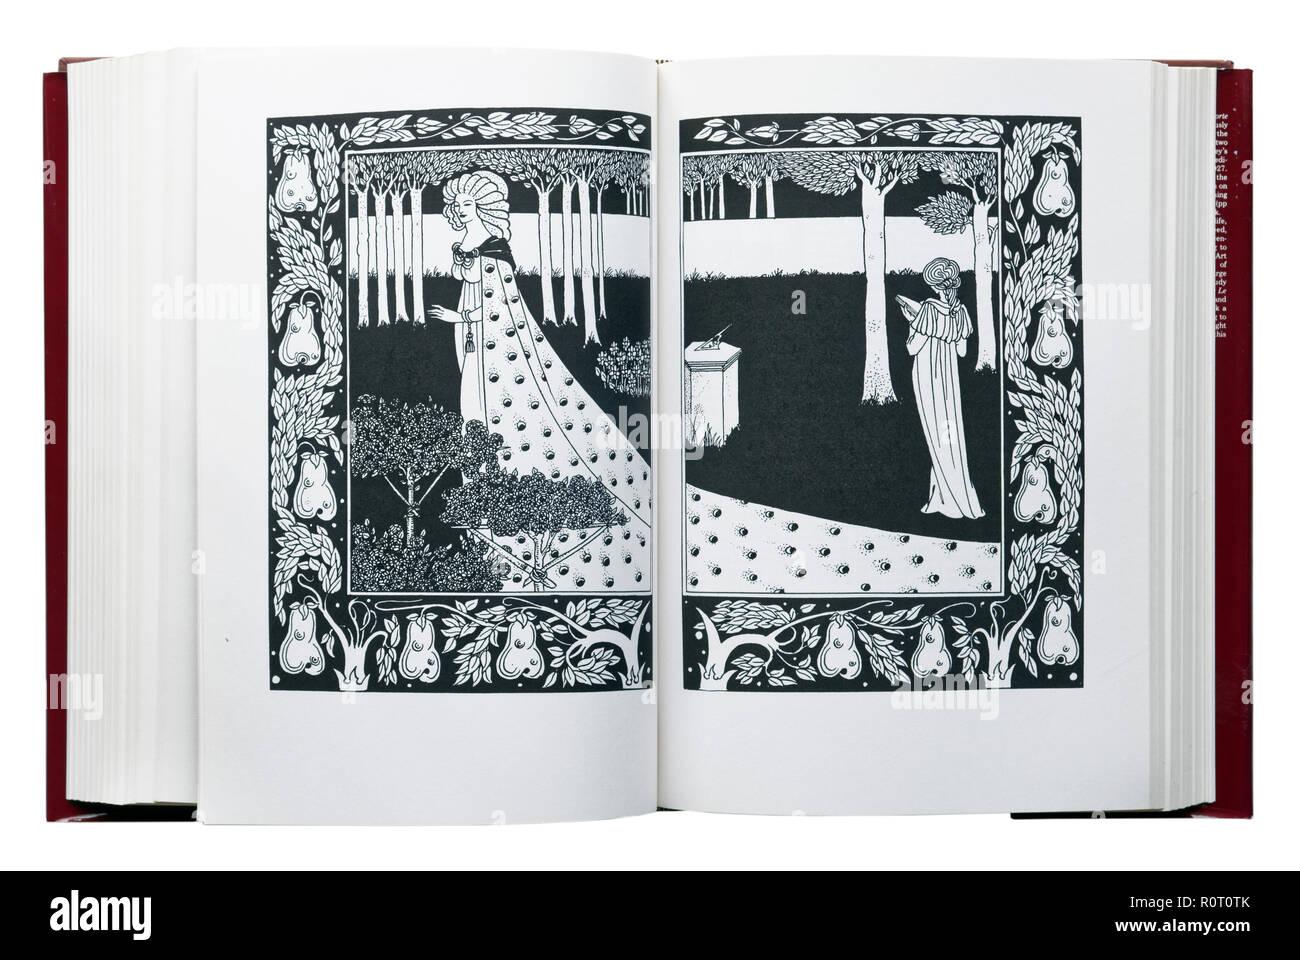 Le Morte d'Arthur by Sir Thomas Malory. Illustration La Beale Isoud at Joyous Gard by Aubrey Beardsley - Stock Image